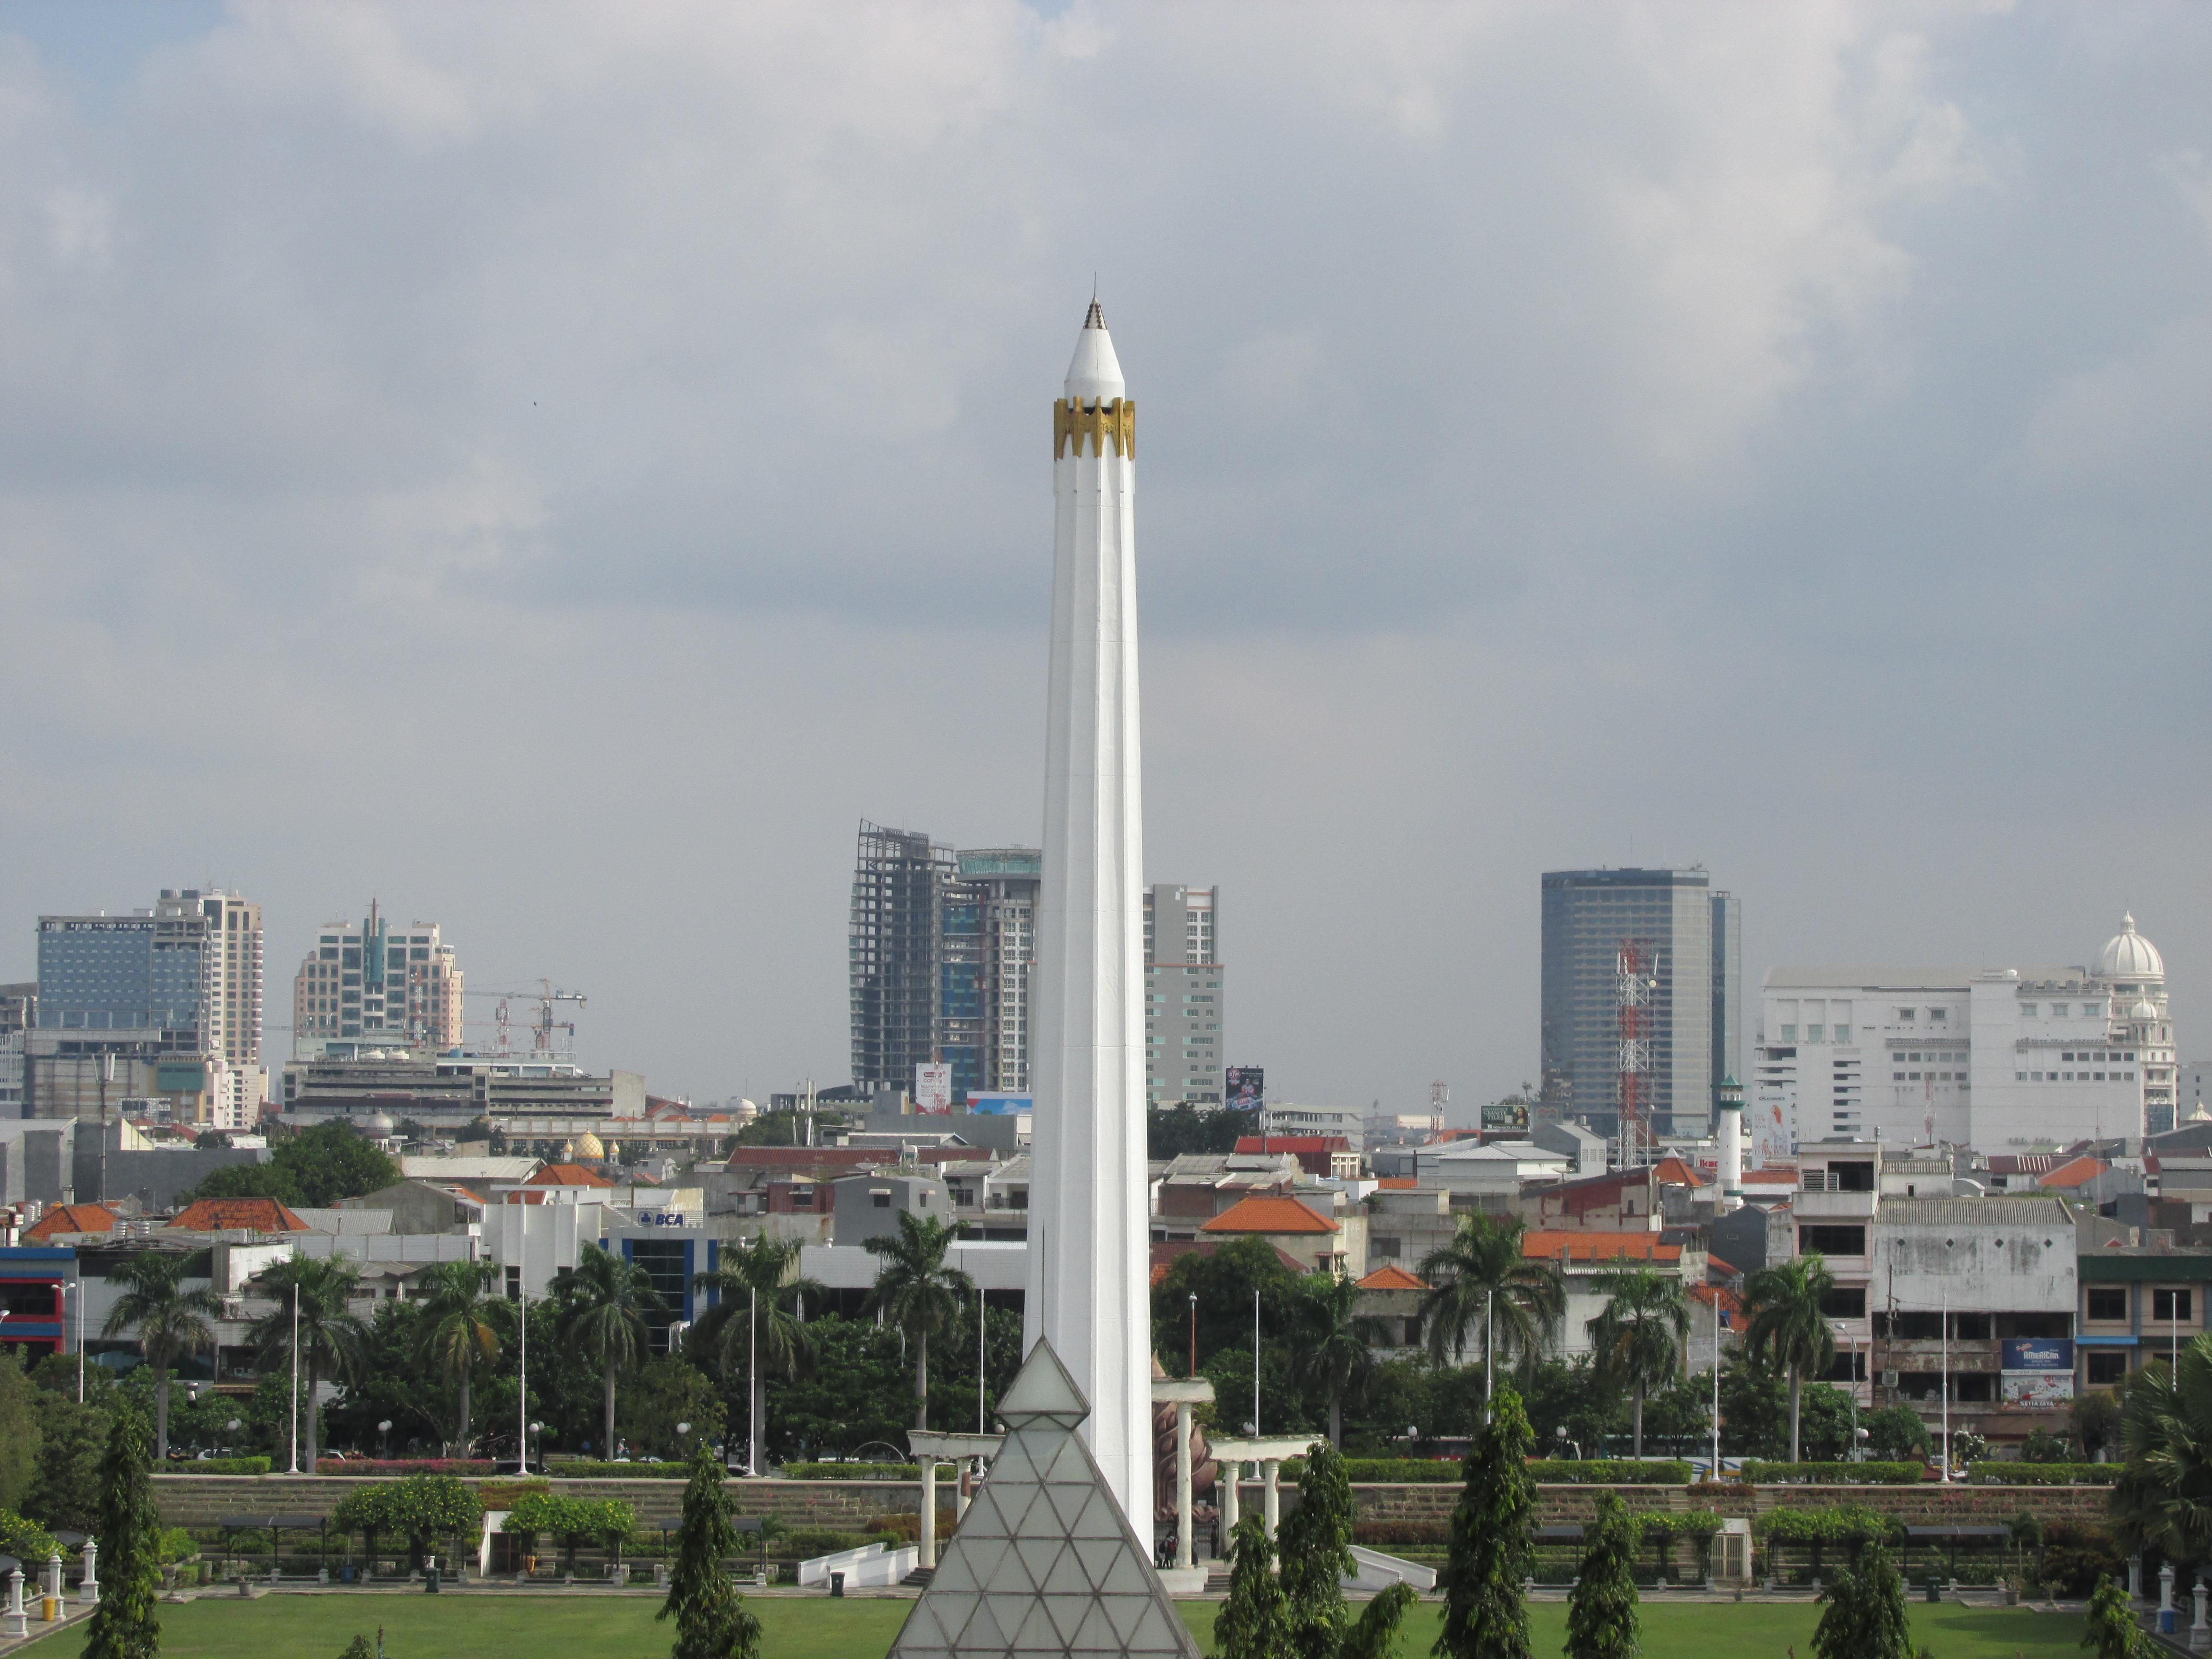 Surabaya Sih Monumen Tugu Pahlawan Wisata Kota